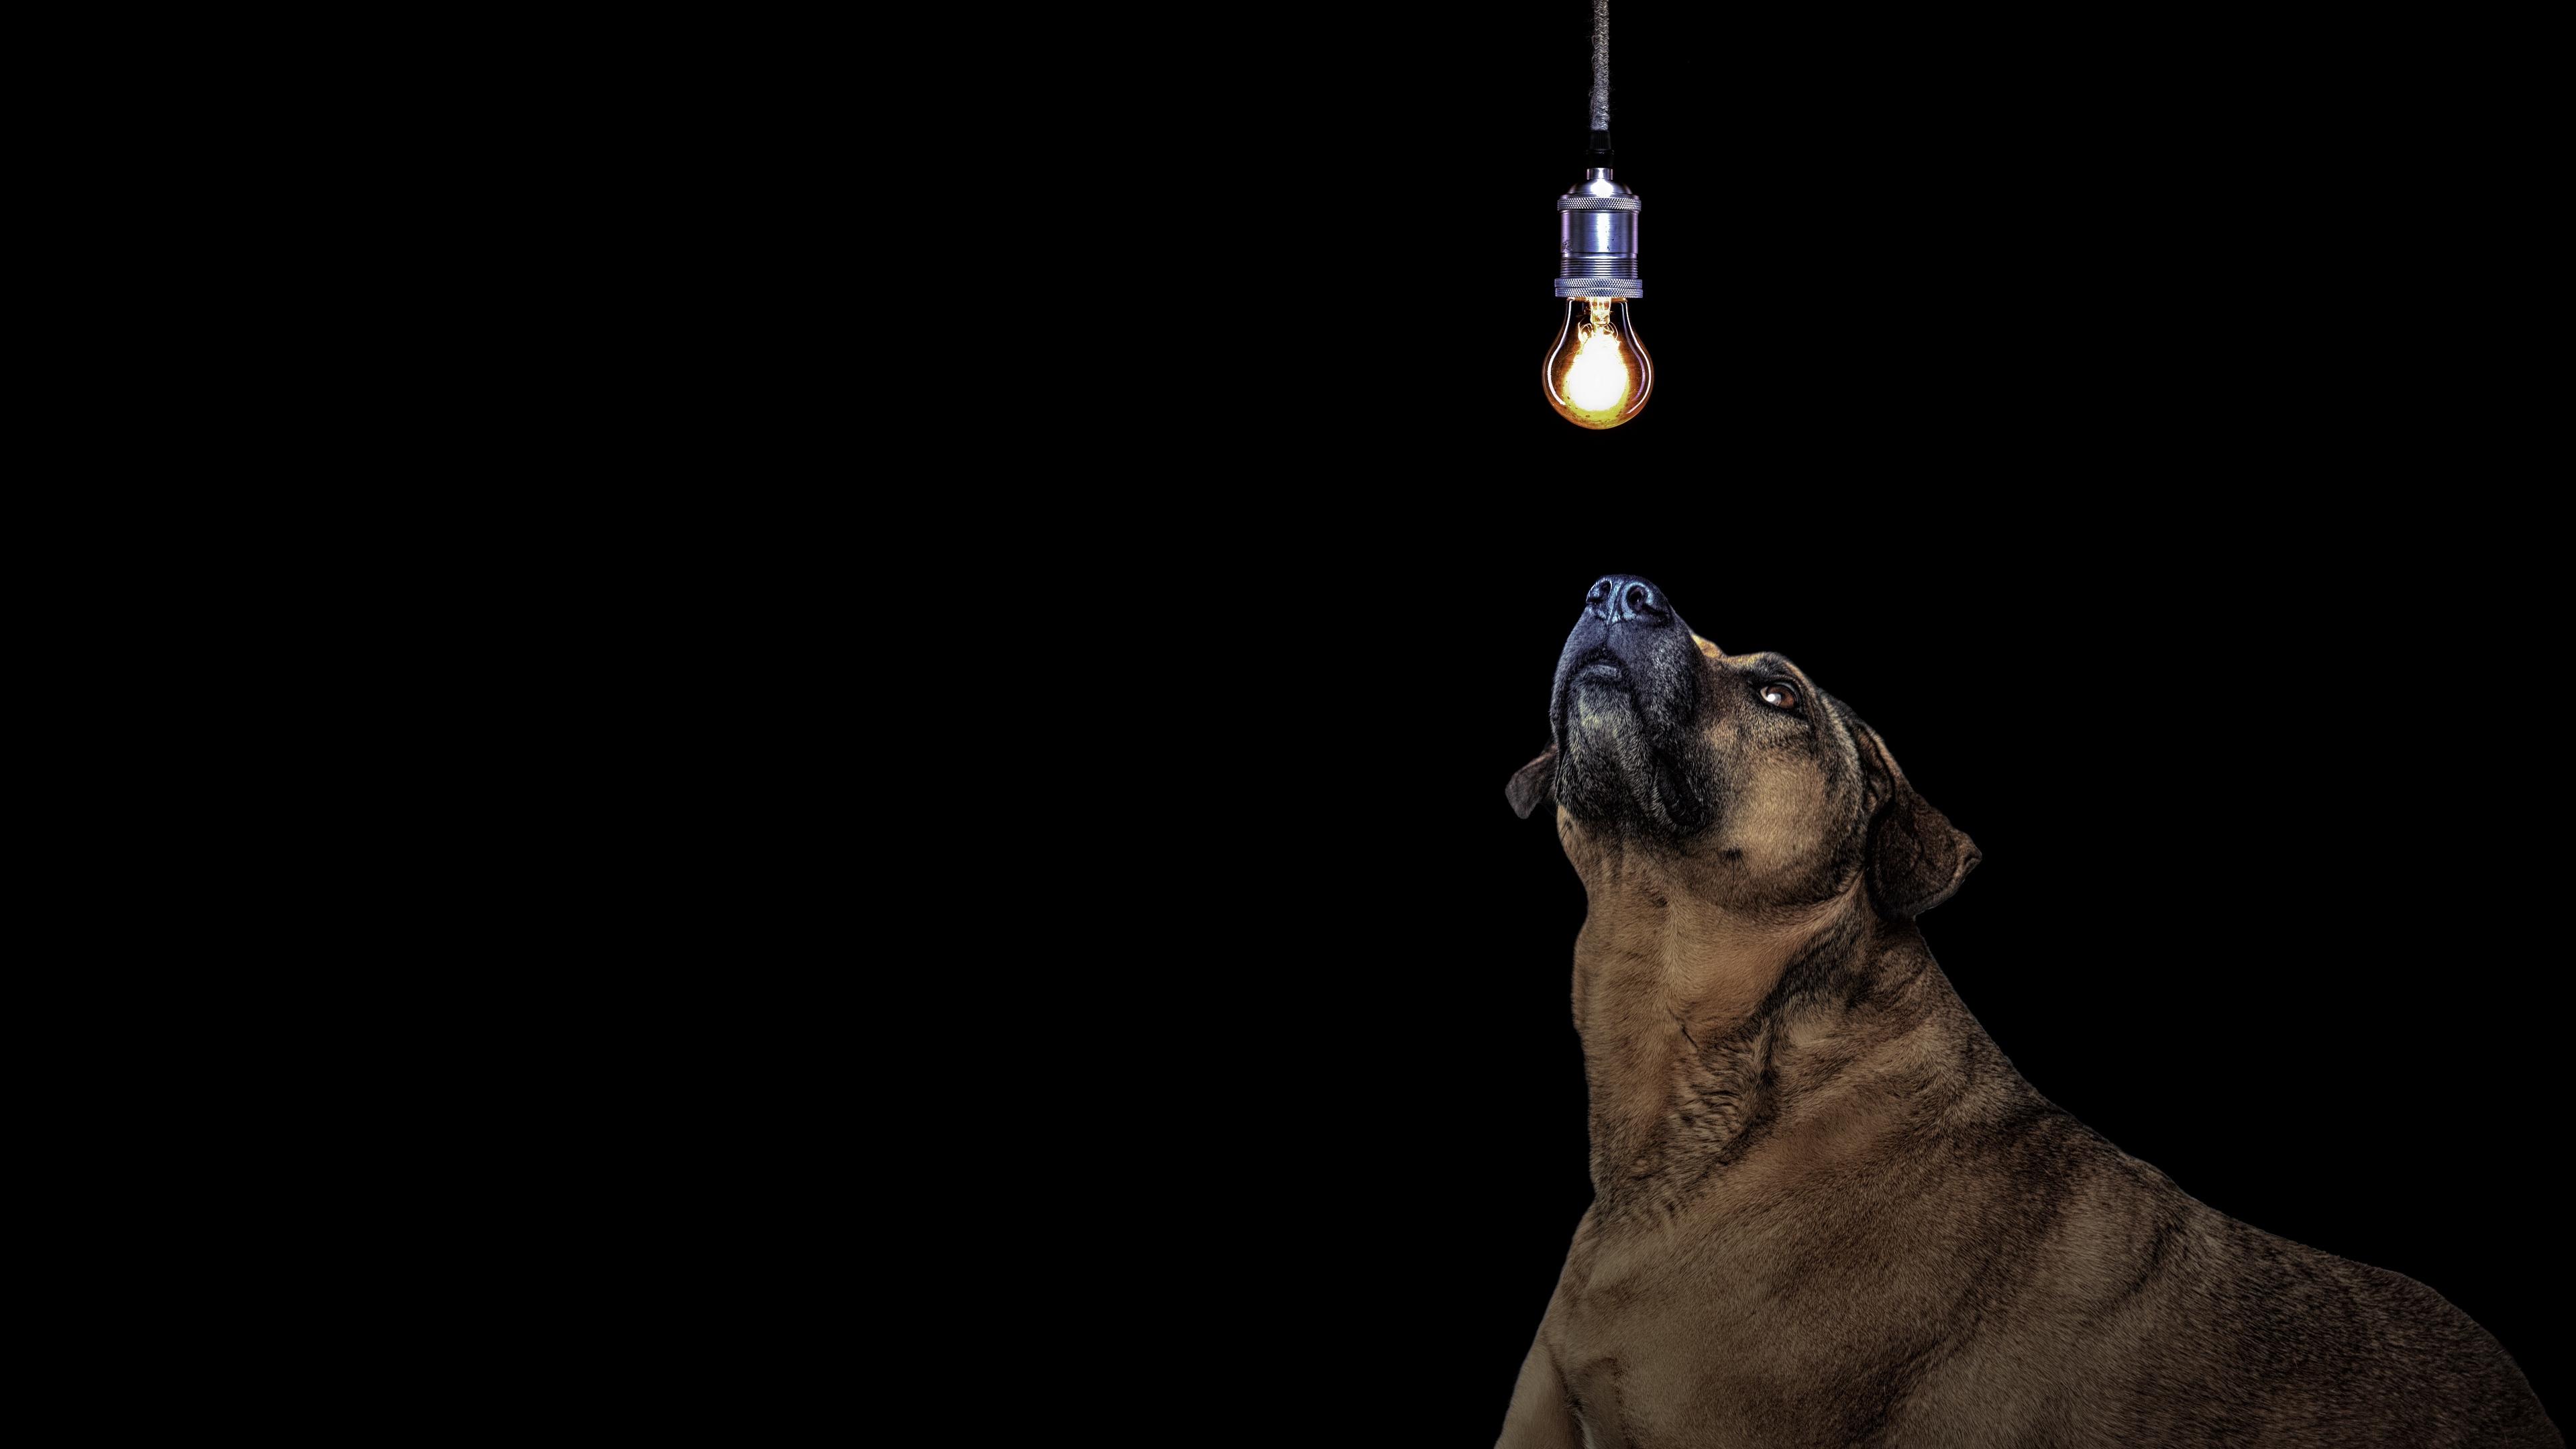 dog light bulb idea 4k 1540574348 - dog, light bulb, idea 4k - light bulb, idea, Dog